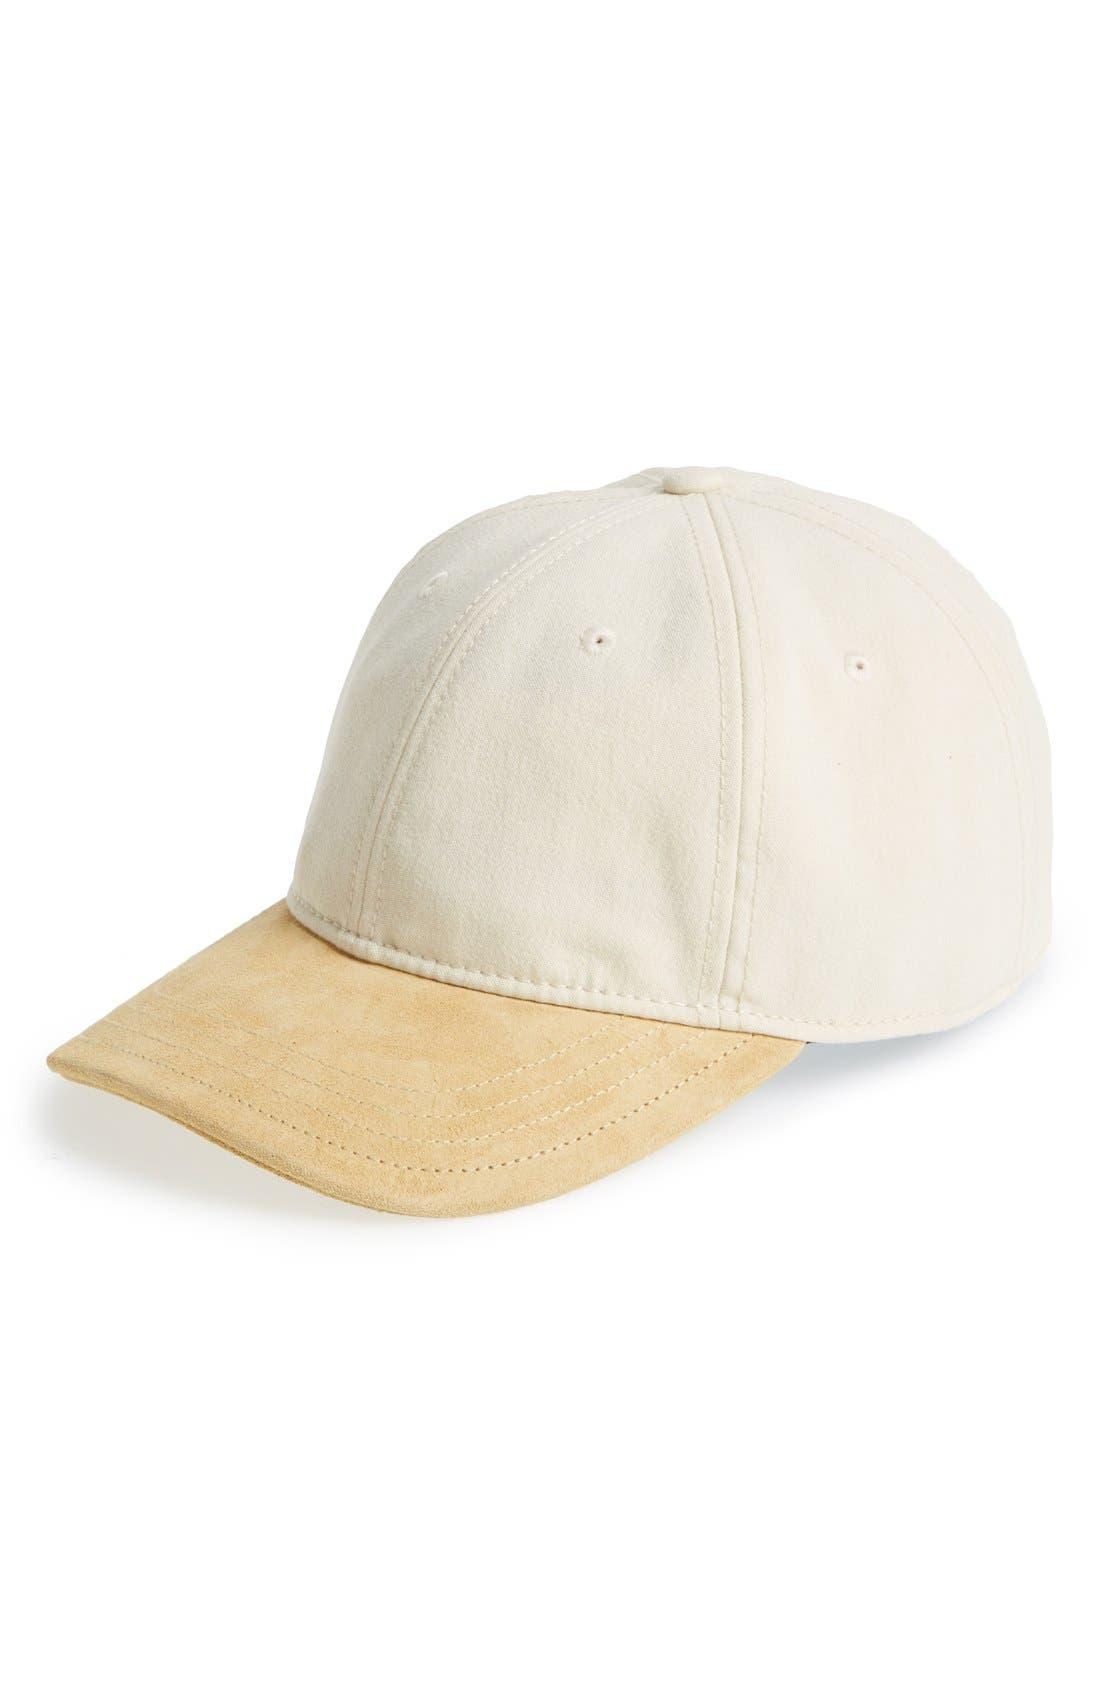 Alternate Image 1 Selected - rag & bone Leather Brim Adjustable Baseball Cap